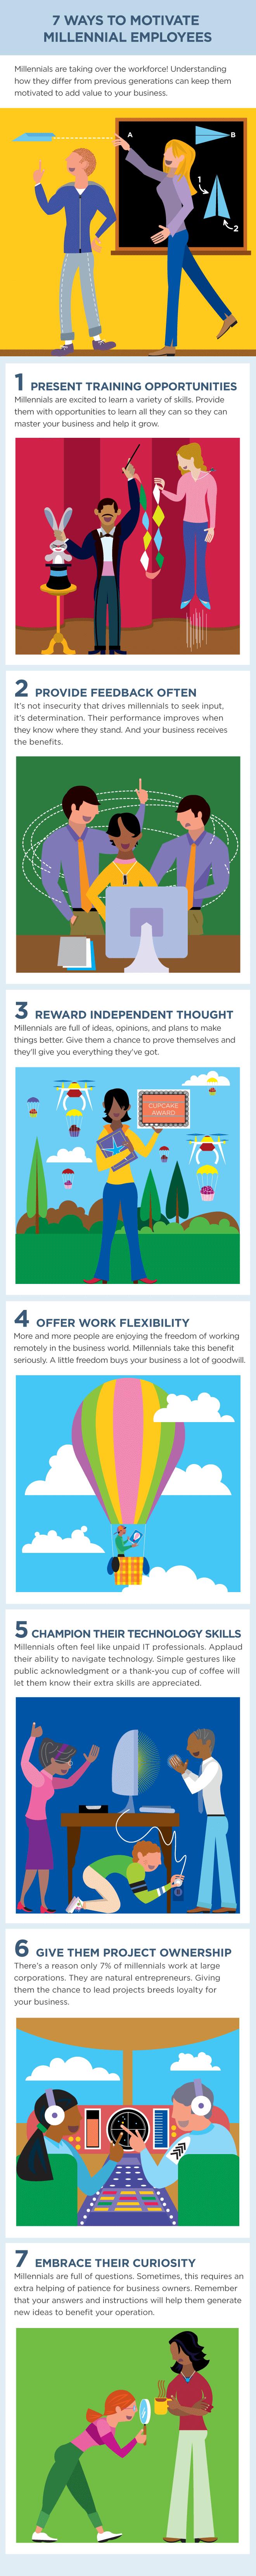 7 Ways to Motivate Millennial Employees